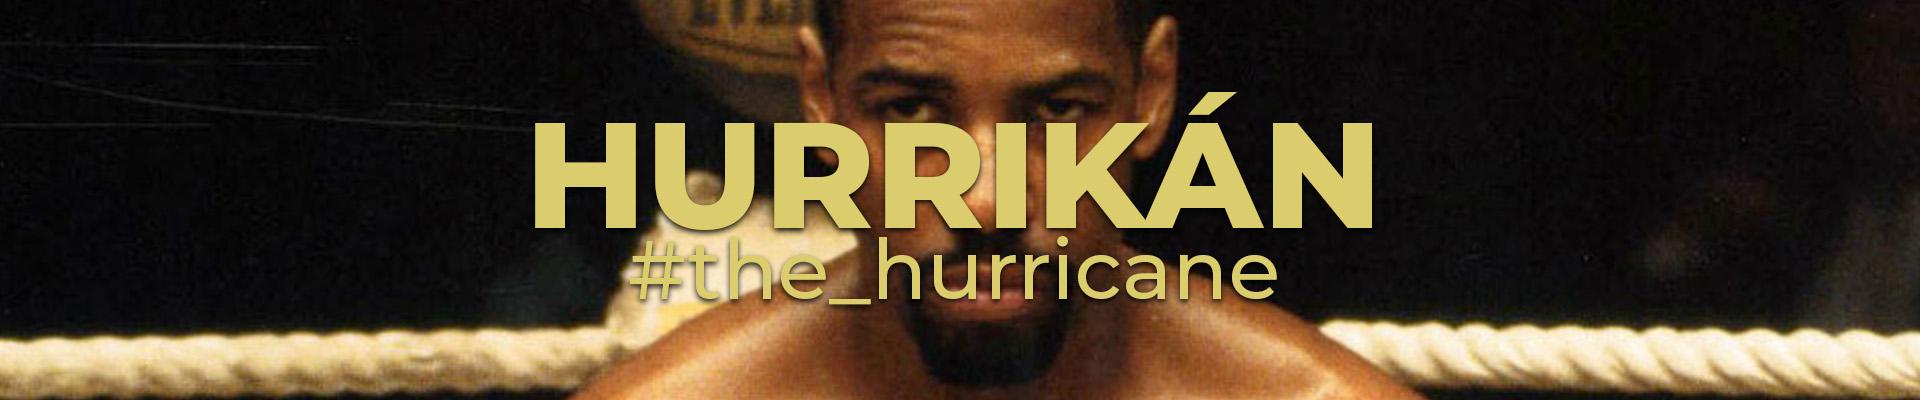 The Hurricane | Hurrikán